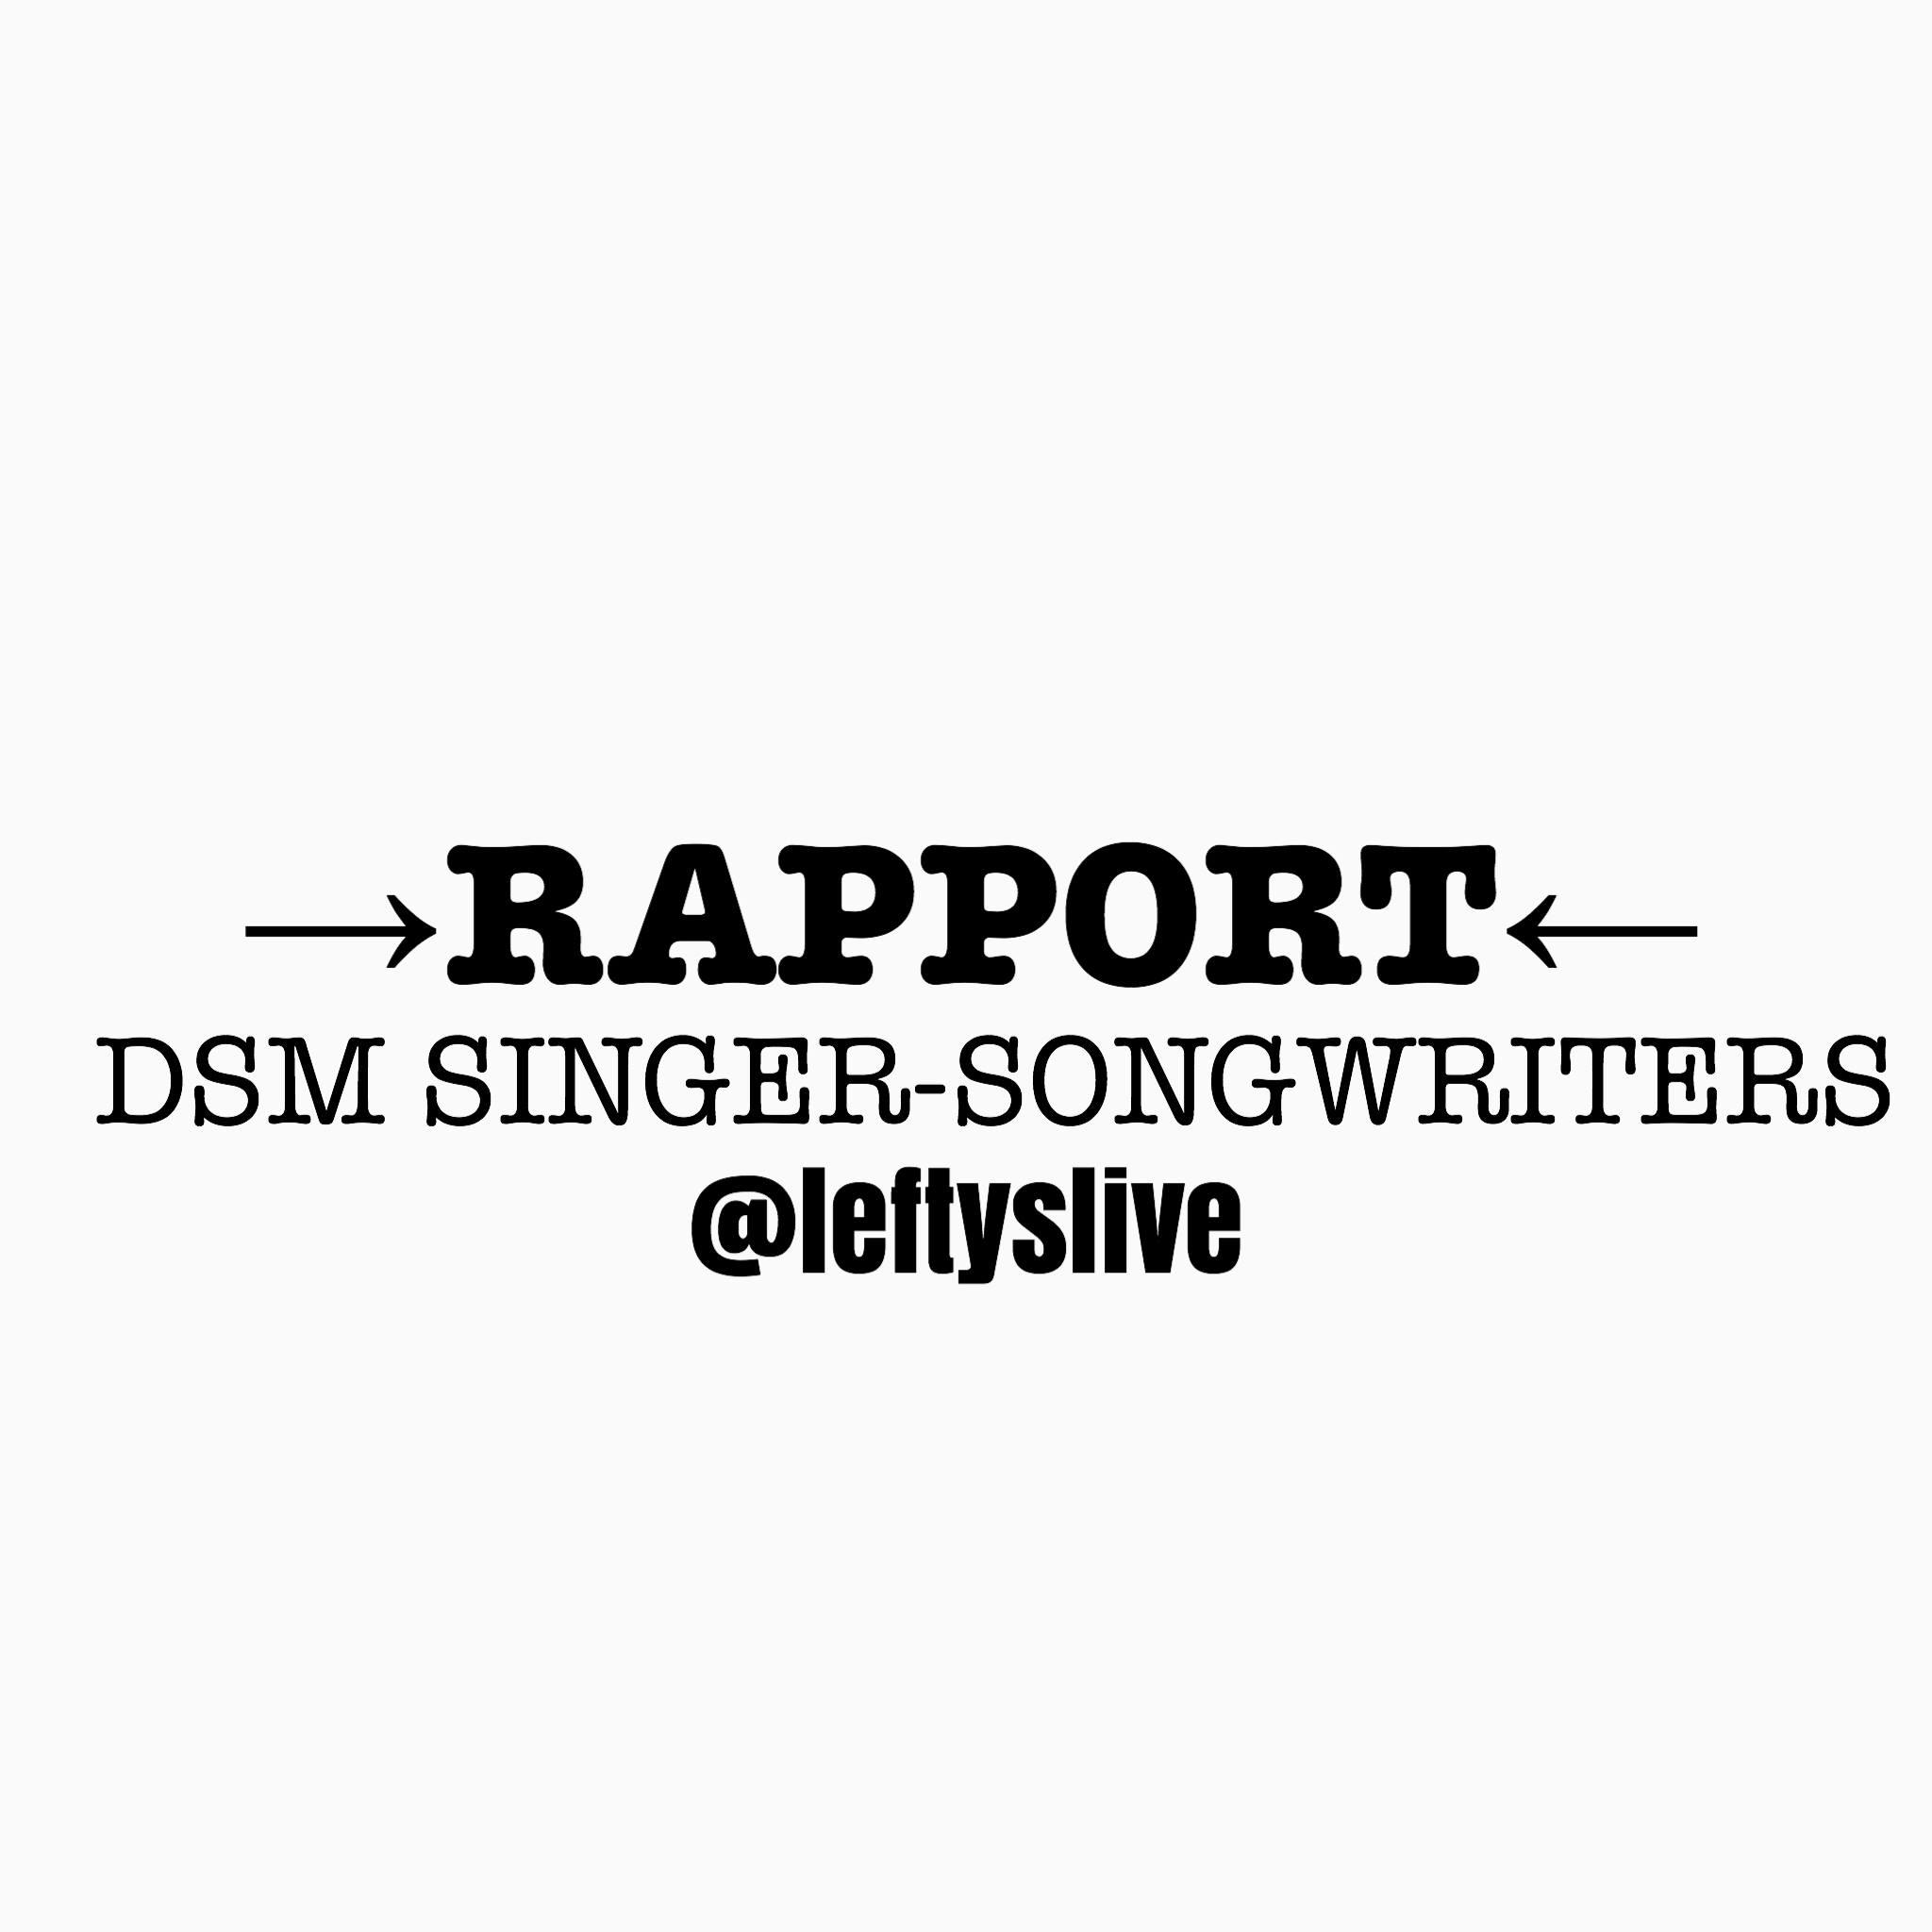 Rapport.jpg